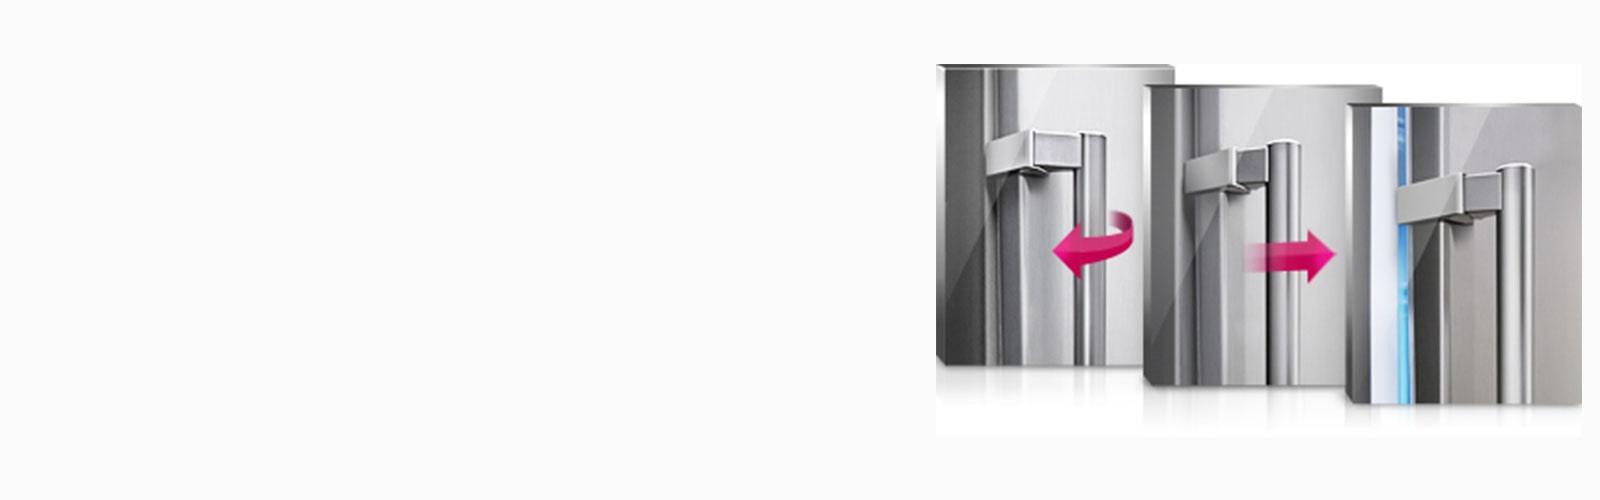 lg-refrigerator-lansen-feature_Easy_Open_Handle_D